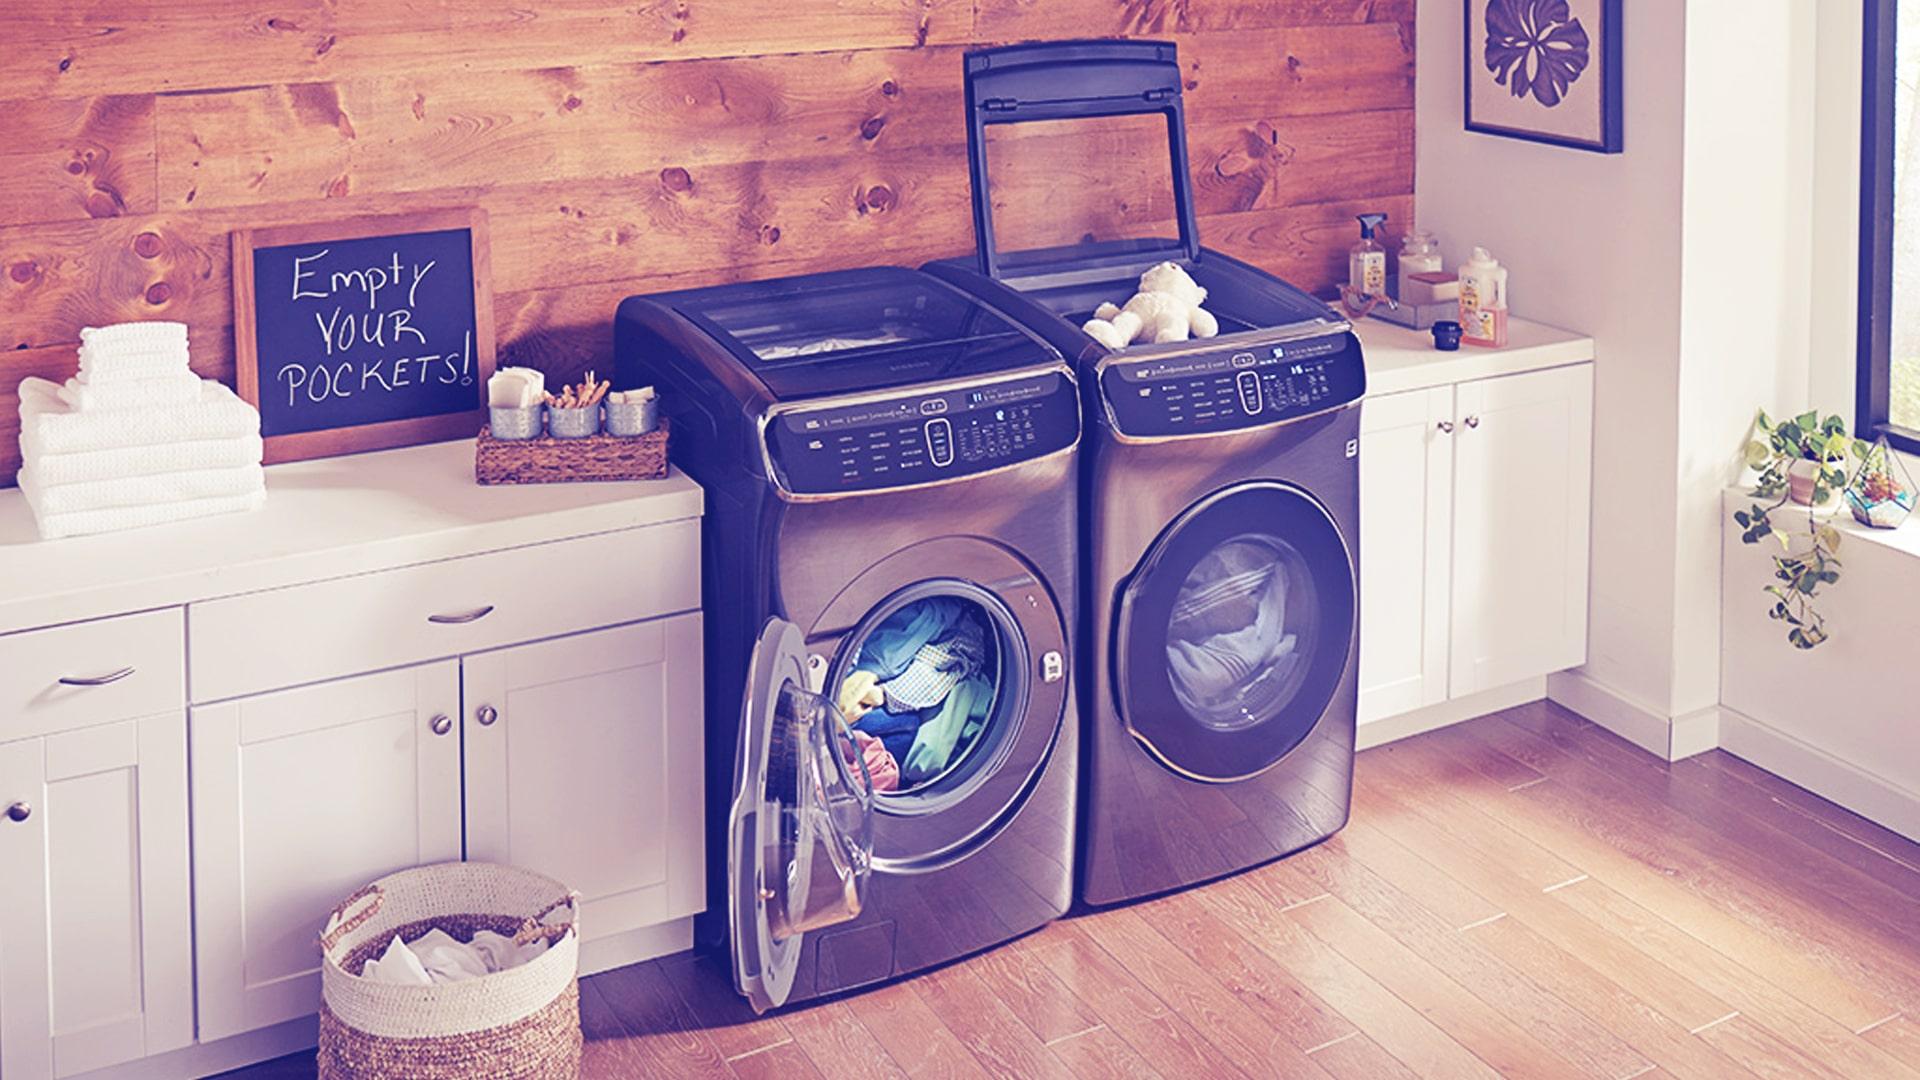 washing machine empty your pockets min